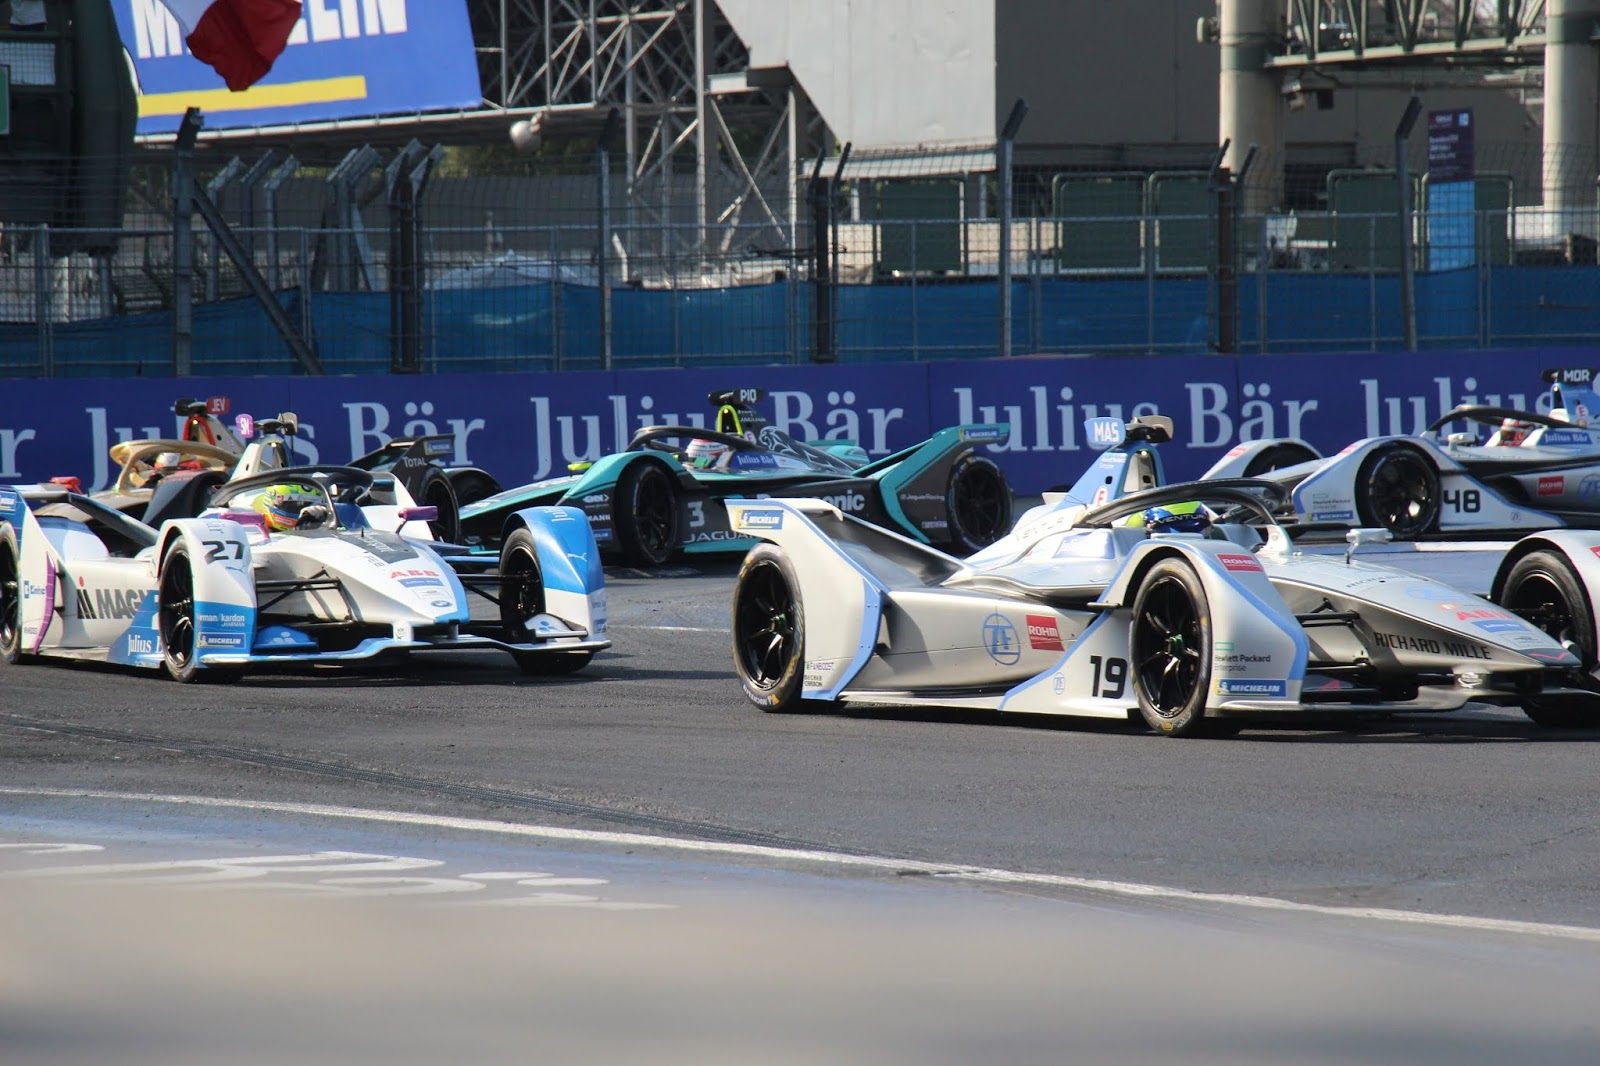 Calendario Formula E 2020 2020.Se Devela El Calendario Para La Temporada 2019 2020 De Abb